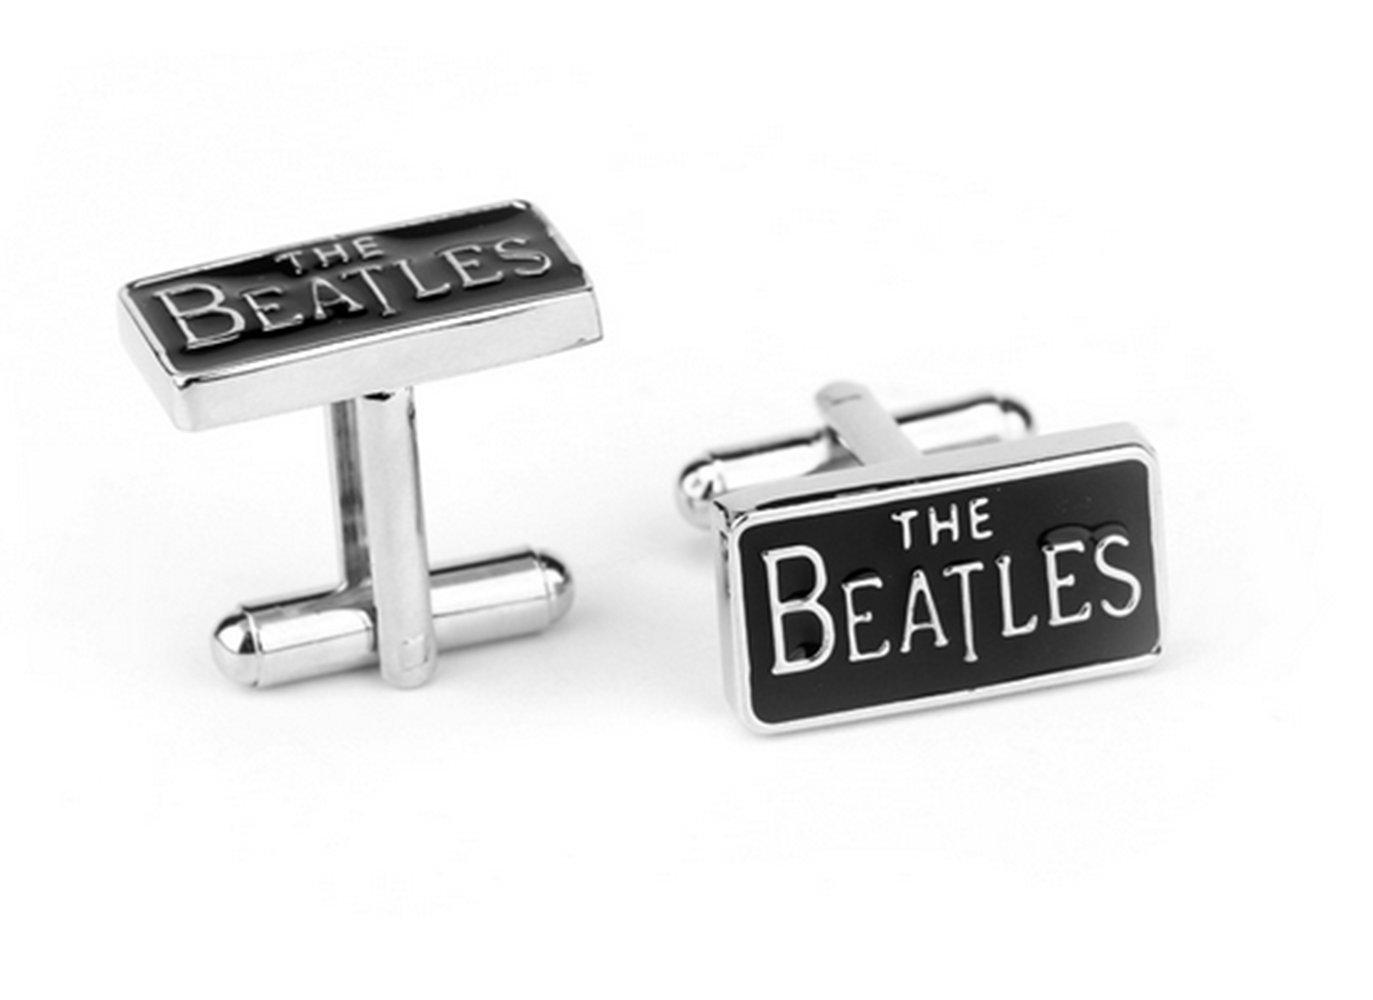 Gudeke British Rock Band The Beatles Cufflinks Groupe de rock Boutons de manchette